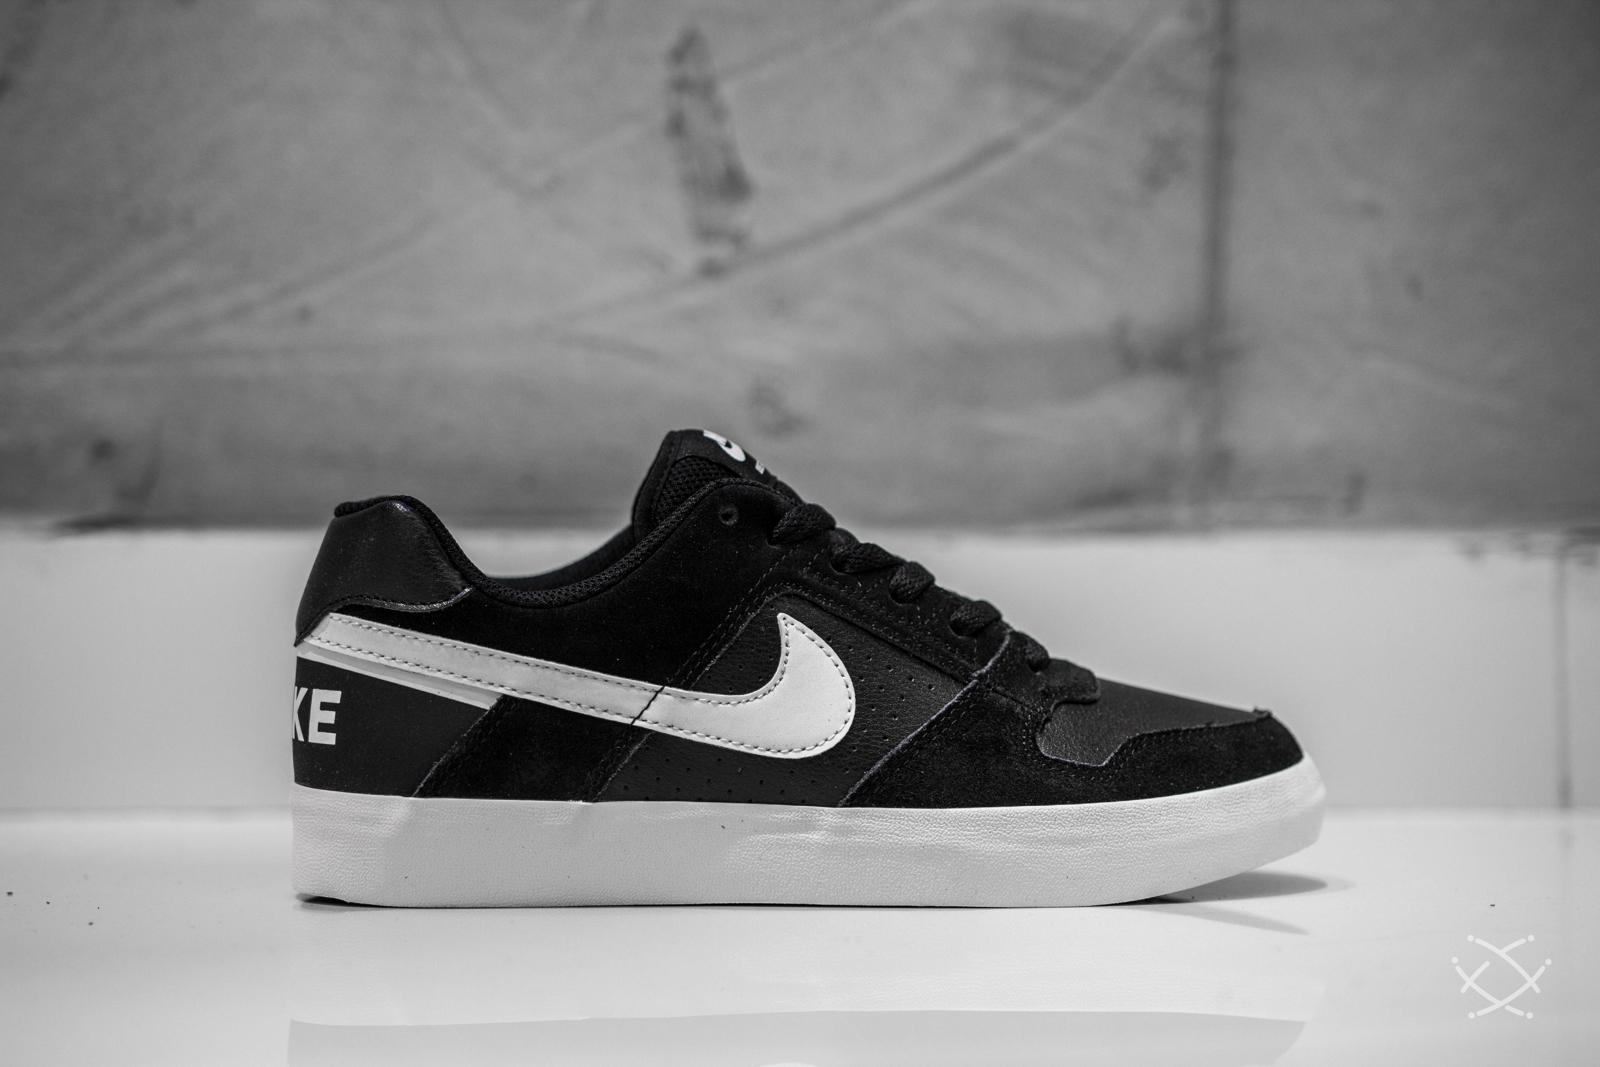 f96af32e746e Каталог товаров Sneaker Bar